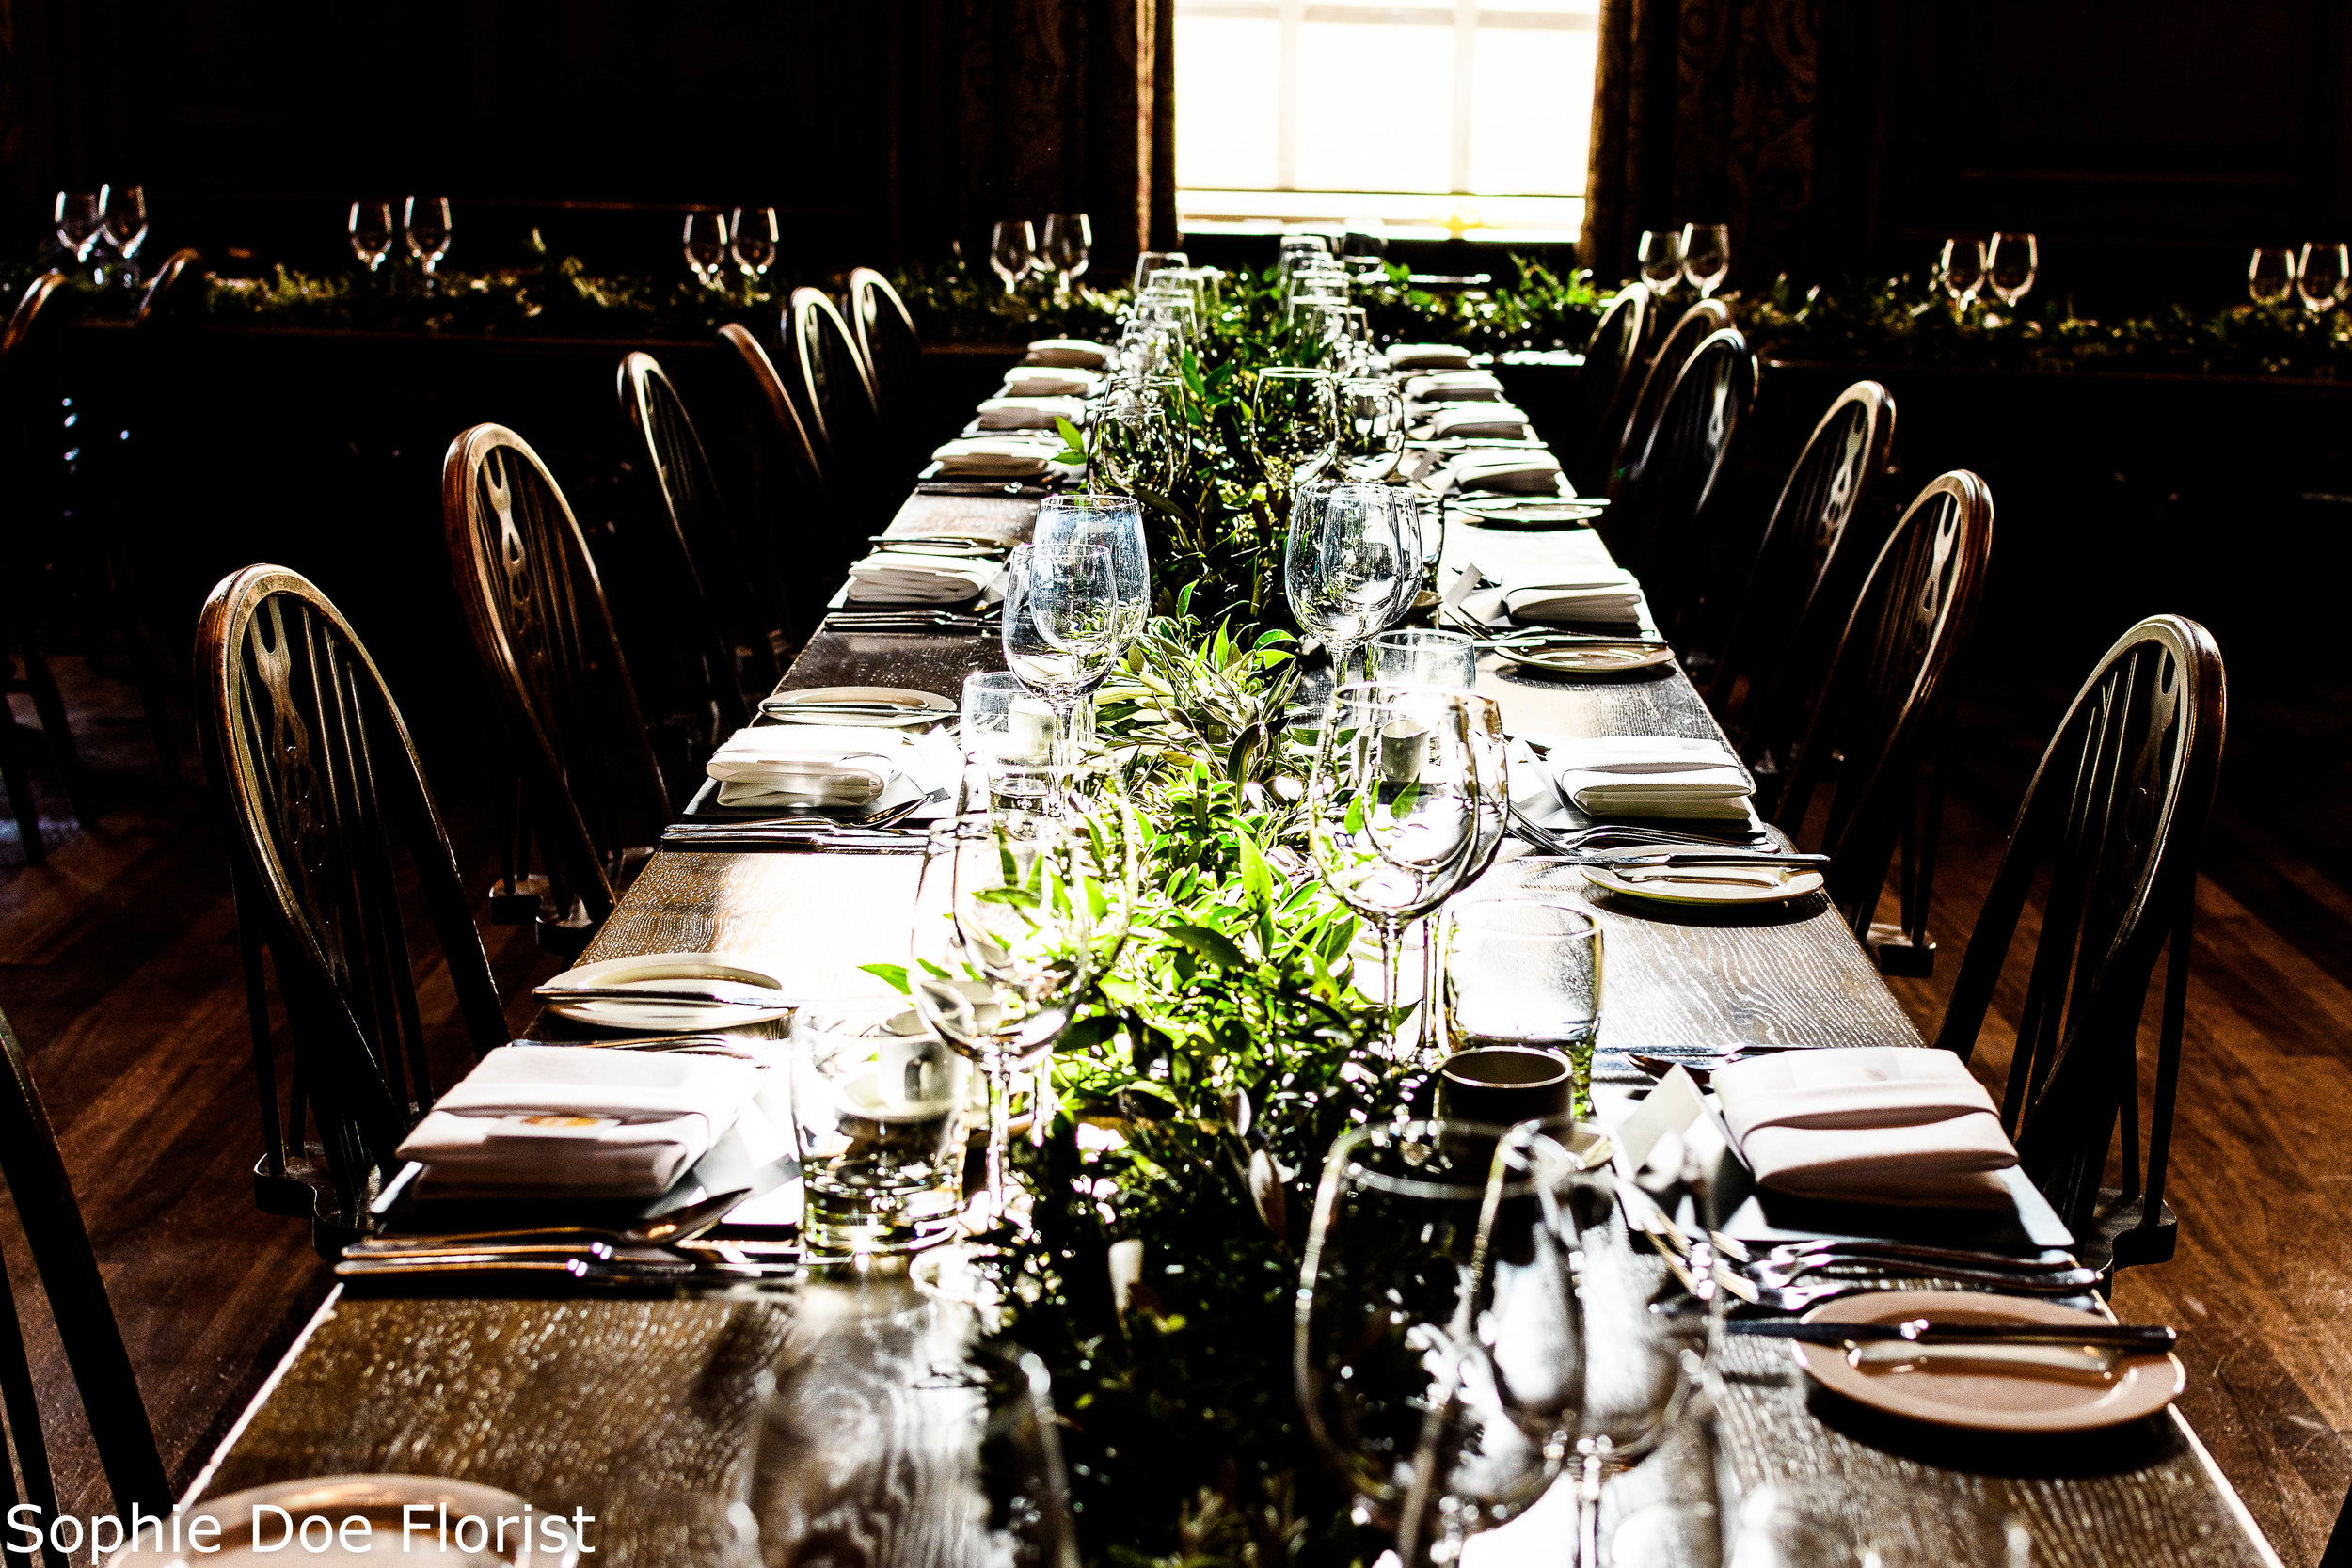 Sophie Doe Florist Greenery Table Centre Piece